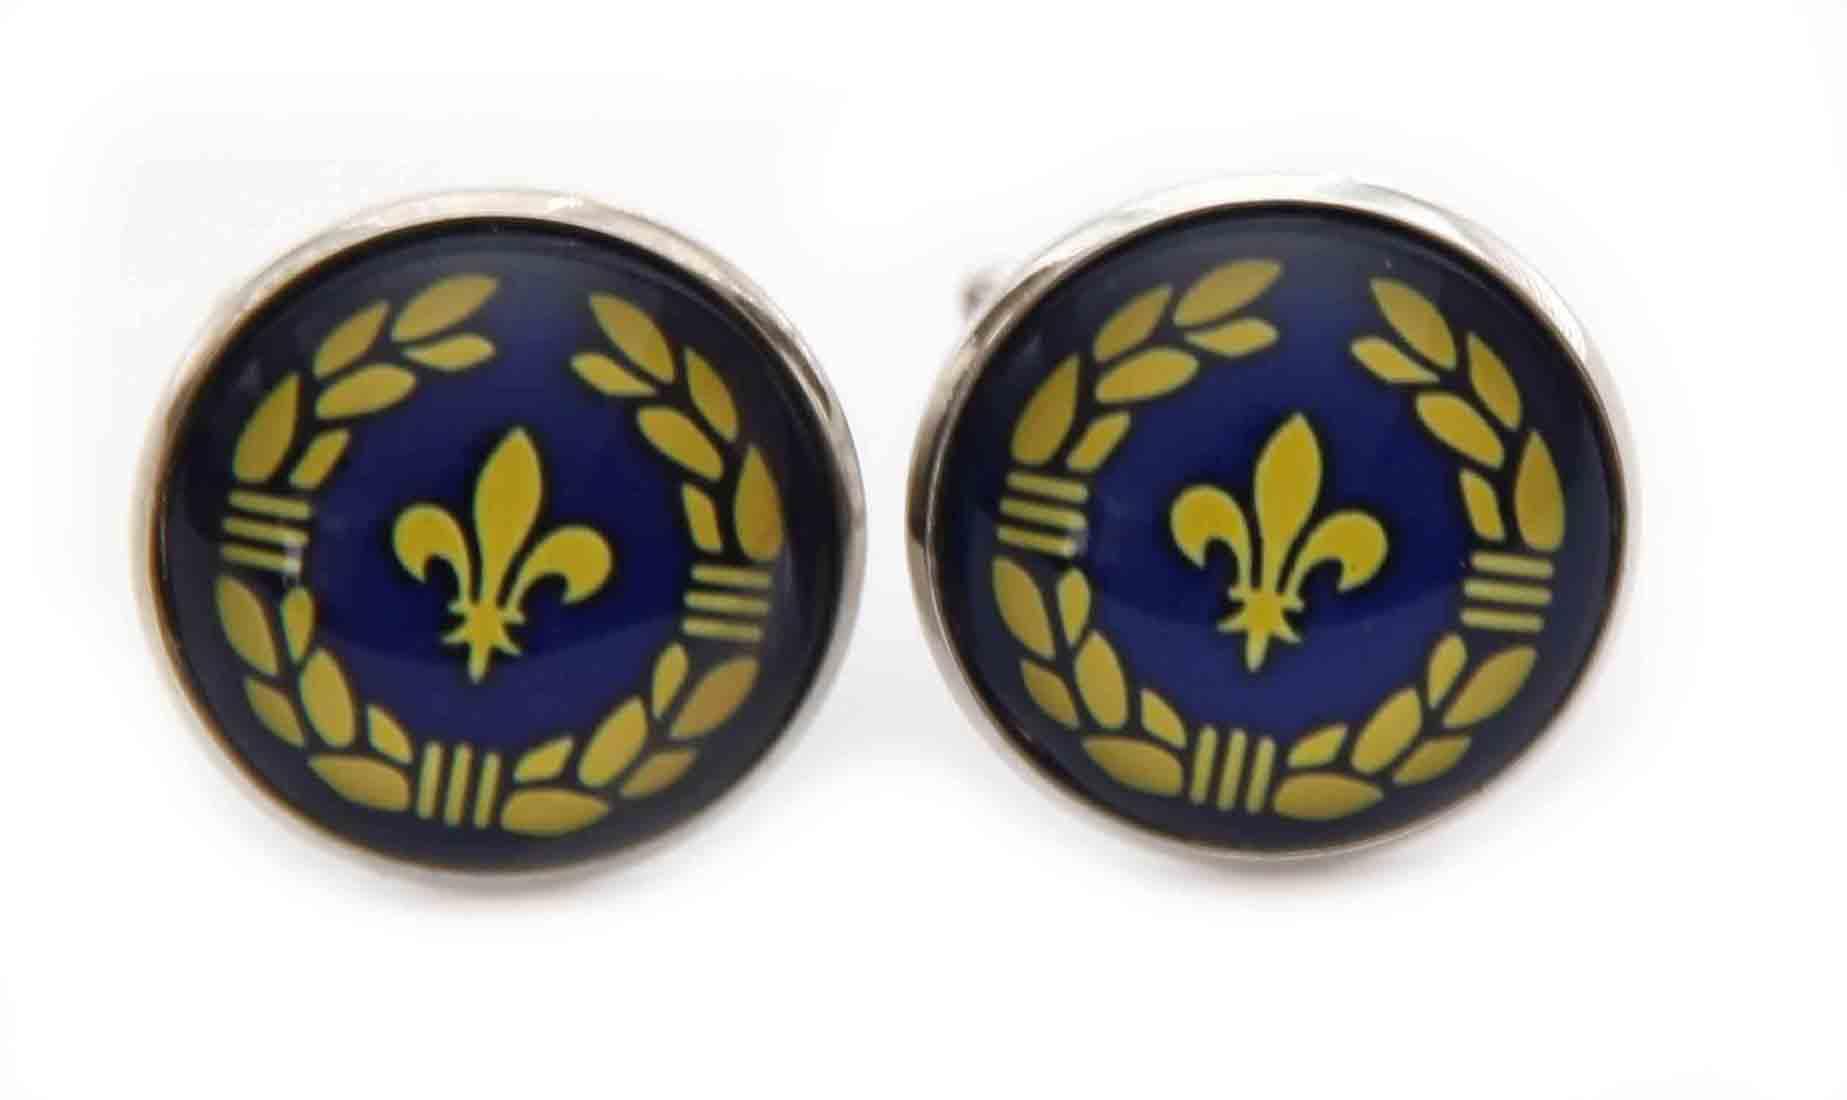 Gascoigne Cufflinks Silver Blue Yellow Fleur de Lis Pattern Men's